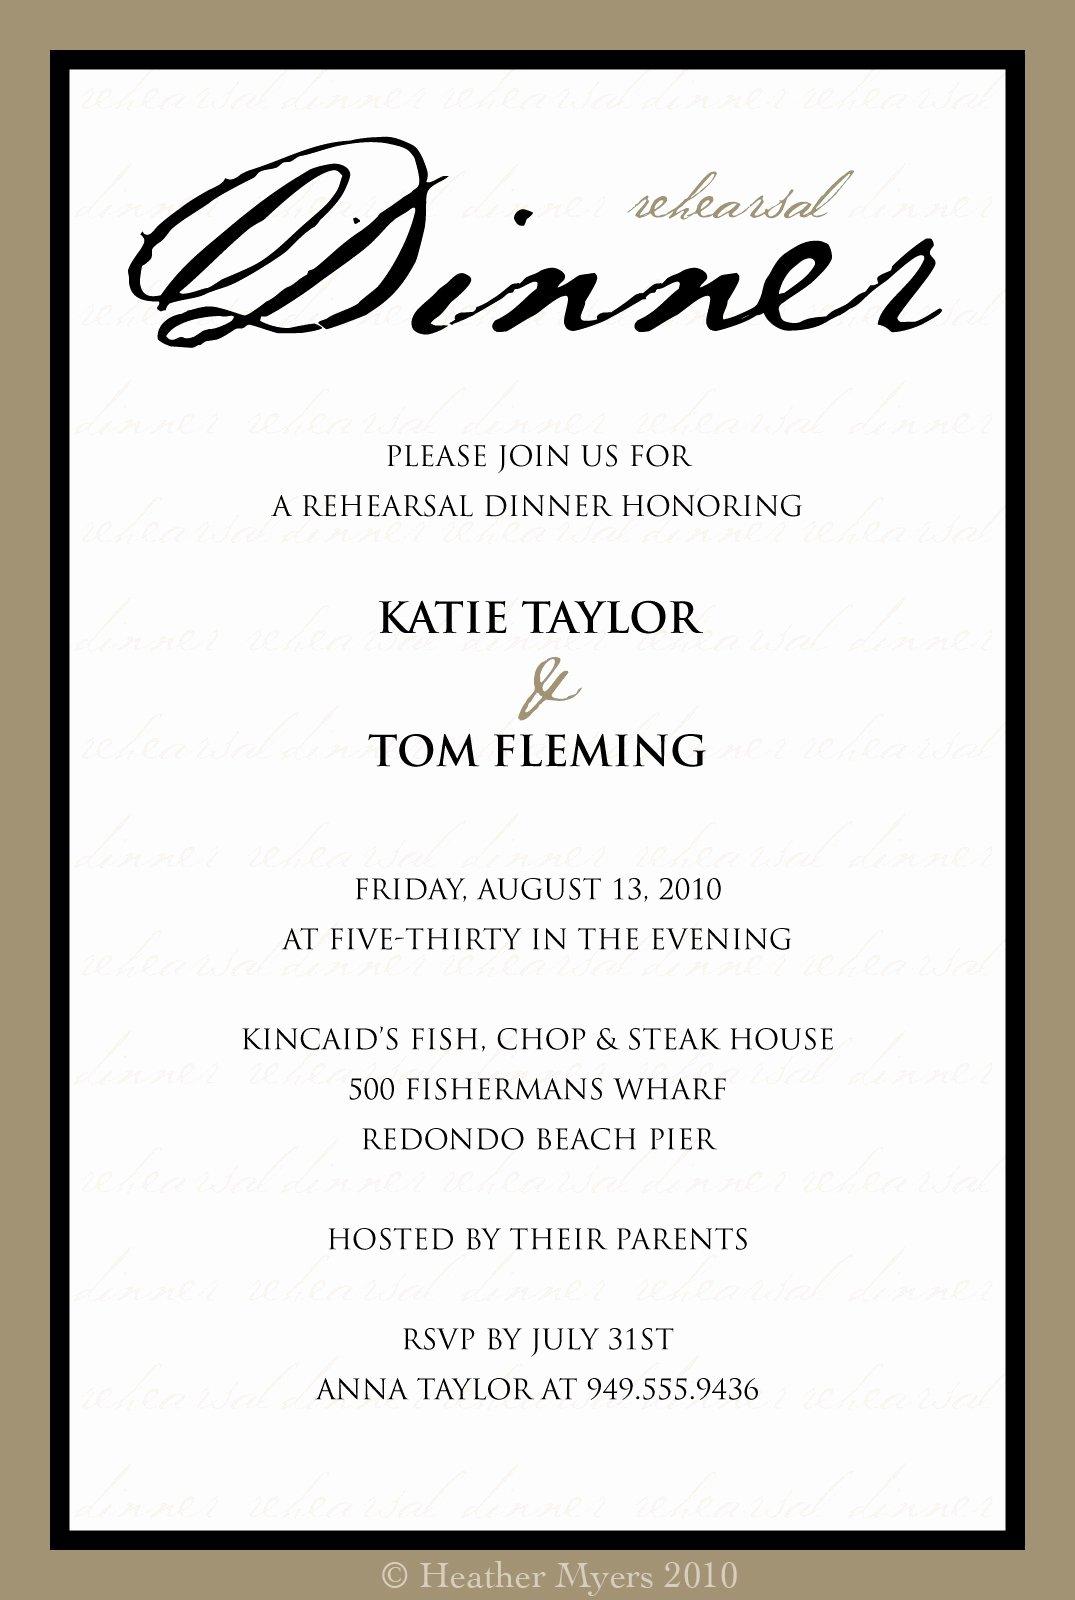 Formal Dinner Invitations Templates Lovely formal Dinner Invitation Templates